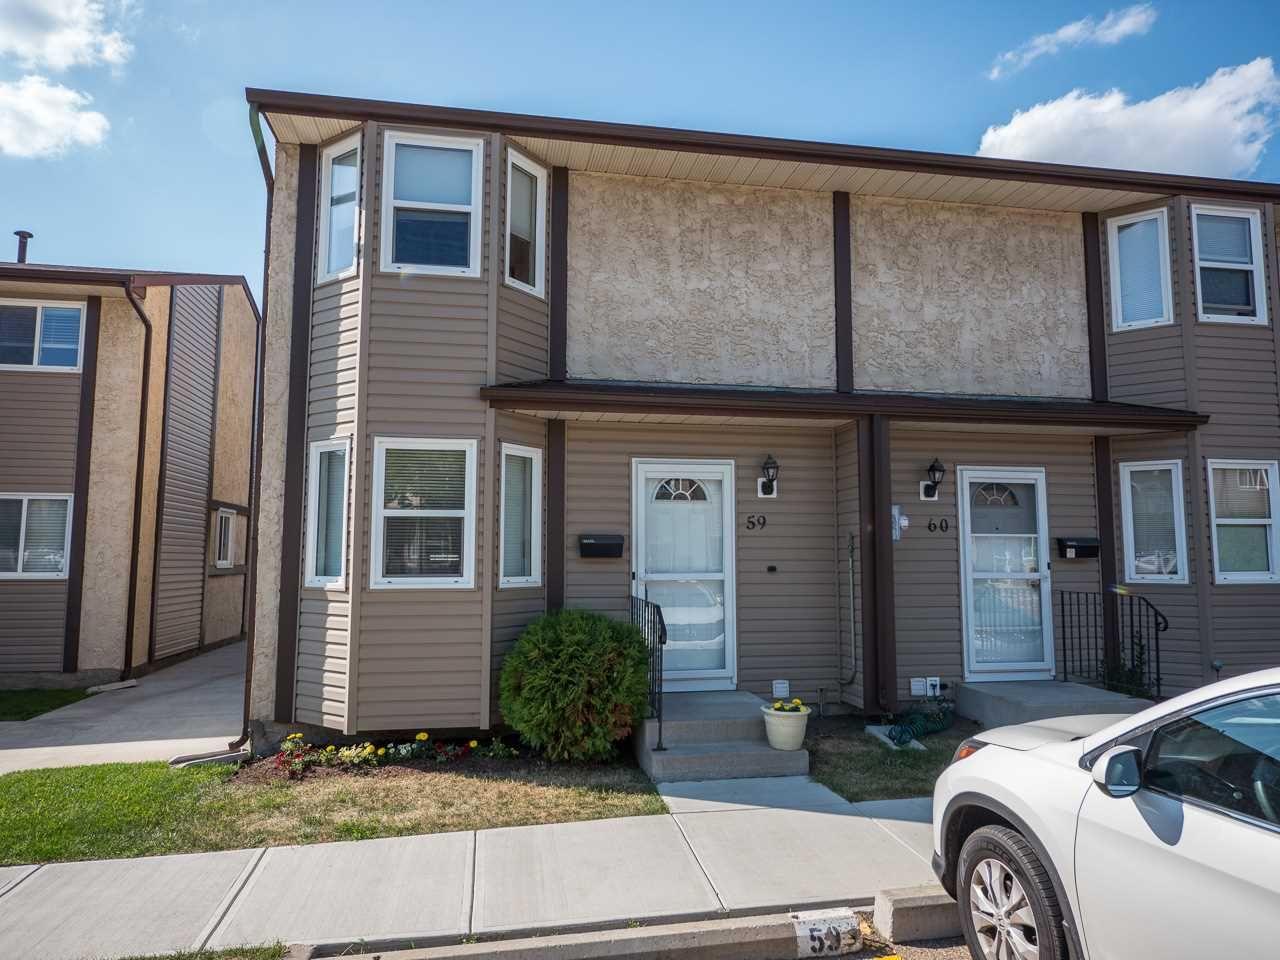 Main Photo: 59 10453 20 Avenue in Edmonton: Zone 16 Townhouse for sale : MLS®# E4241938